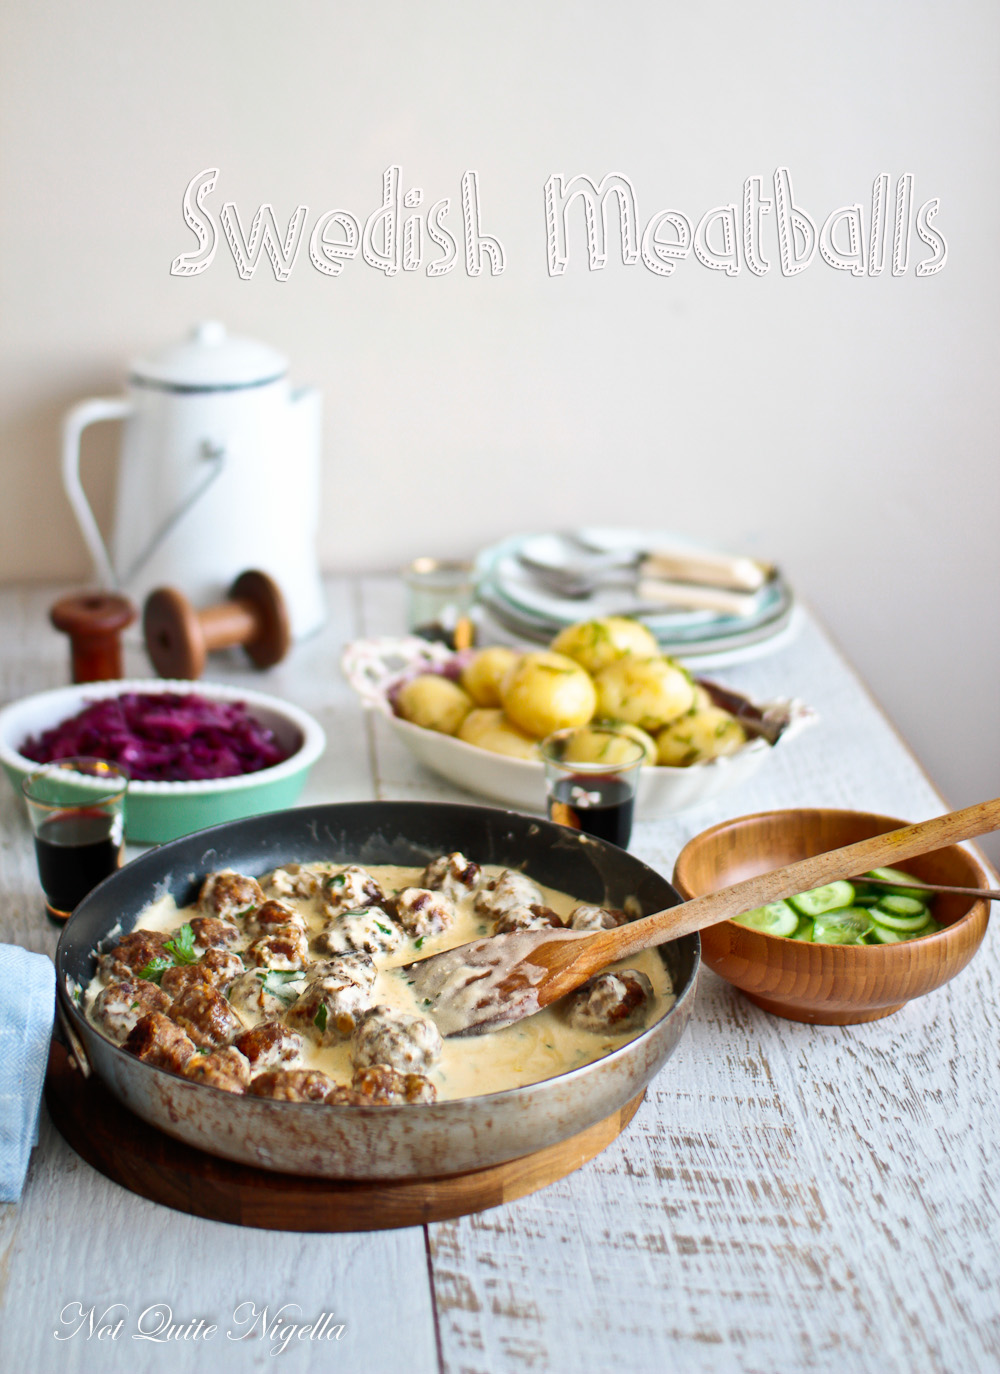 Swedish Meatball Recipe Dinner Not Quite Nigella